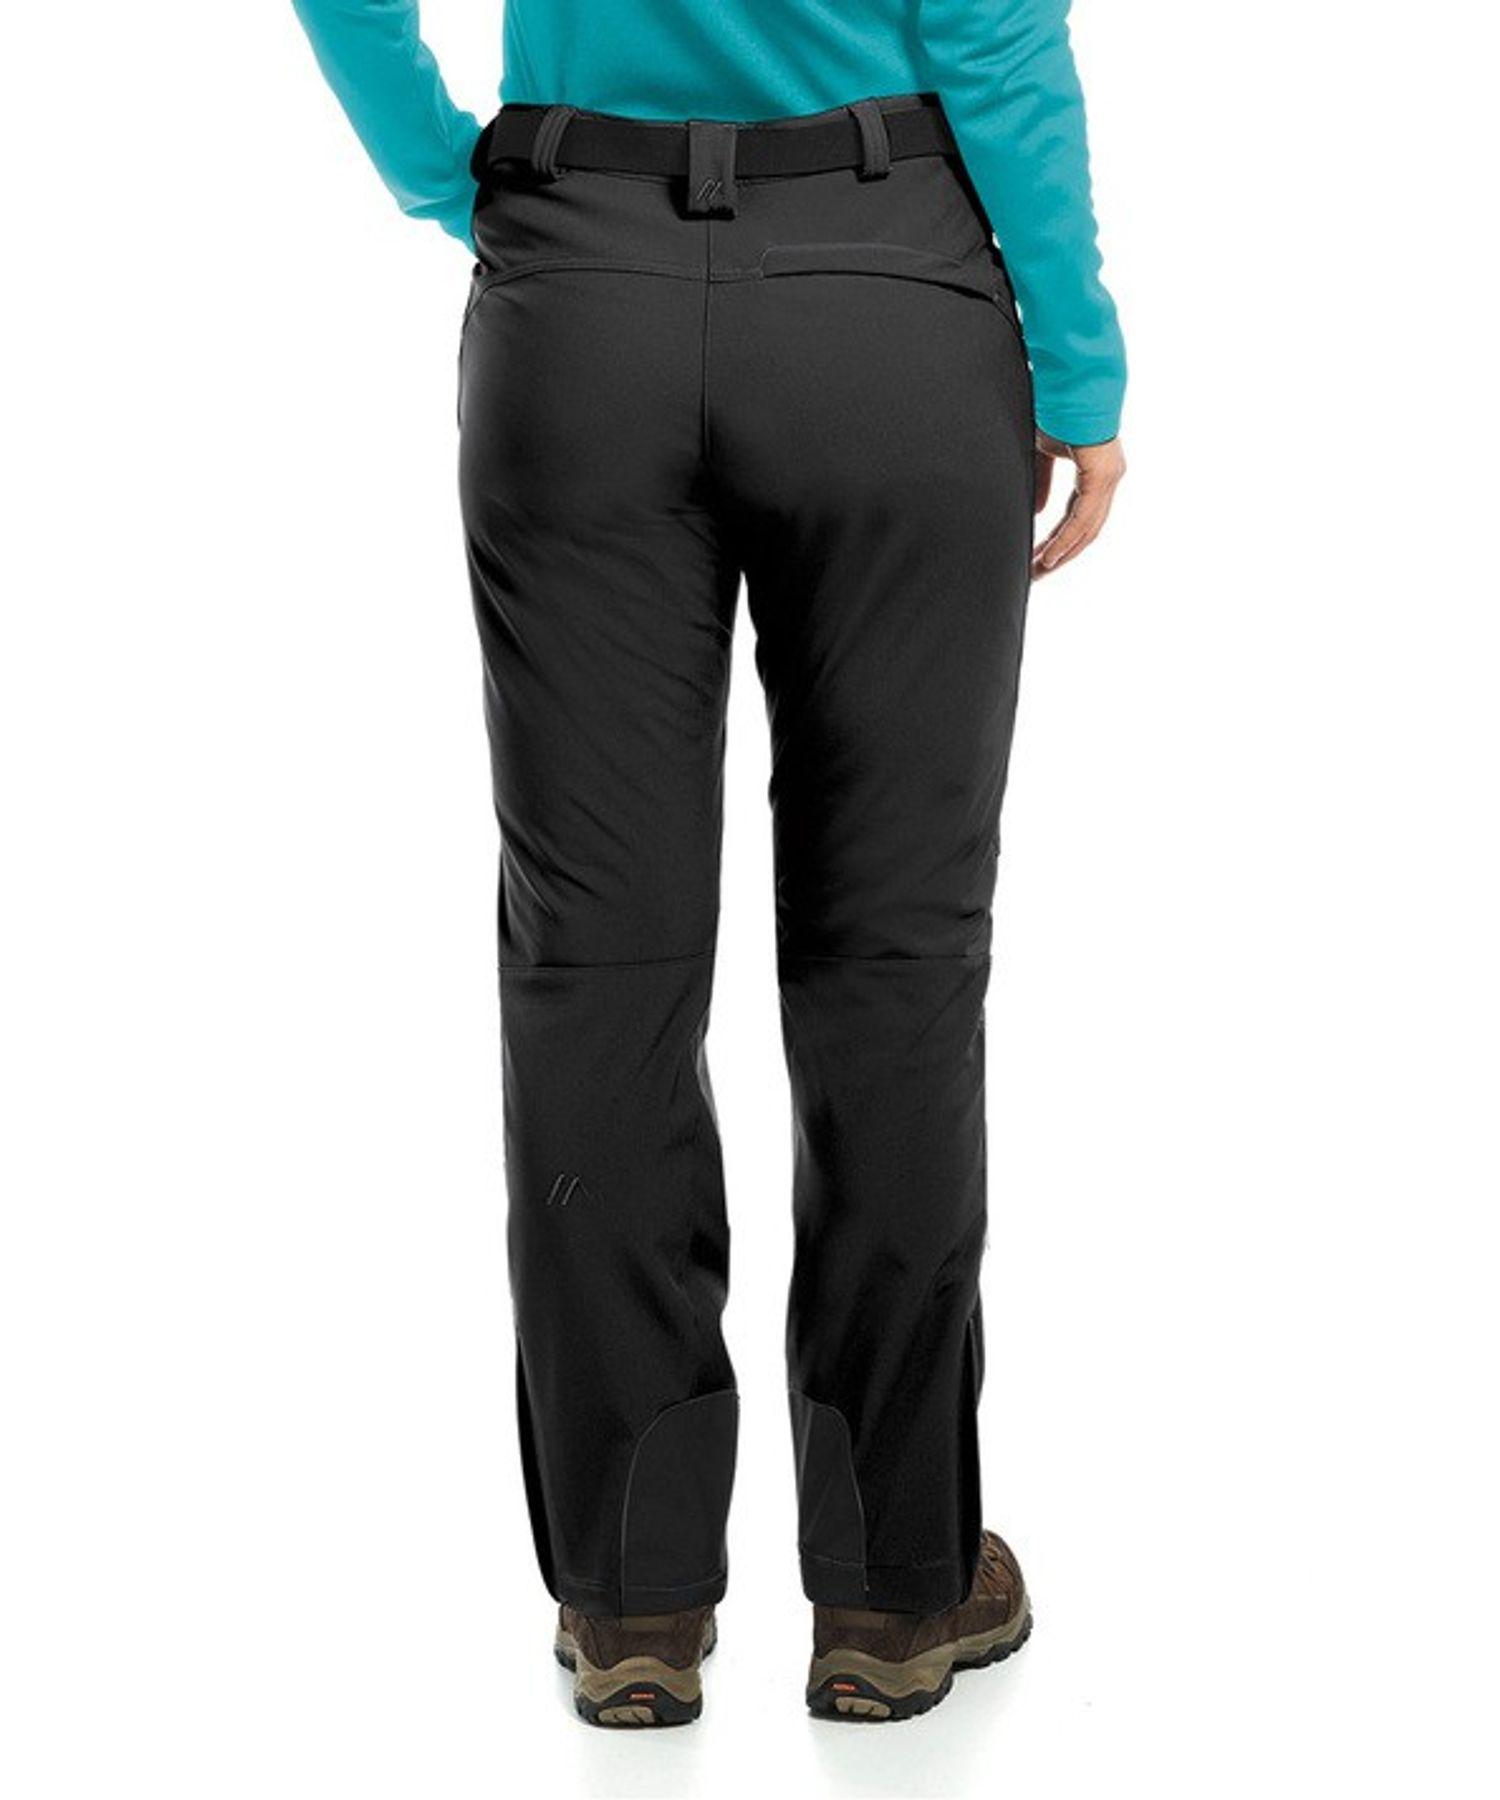 Maier Sports- Damen Funktionelle Softshell Touren - und Wanderhose in Black Artikel Tech Pants W (236008) – Bild 2